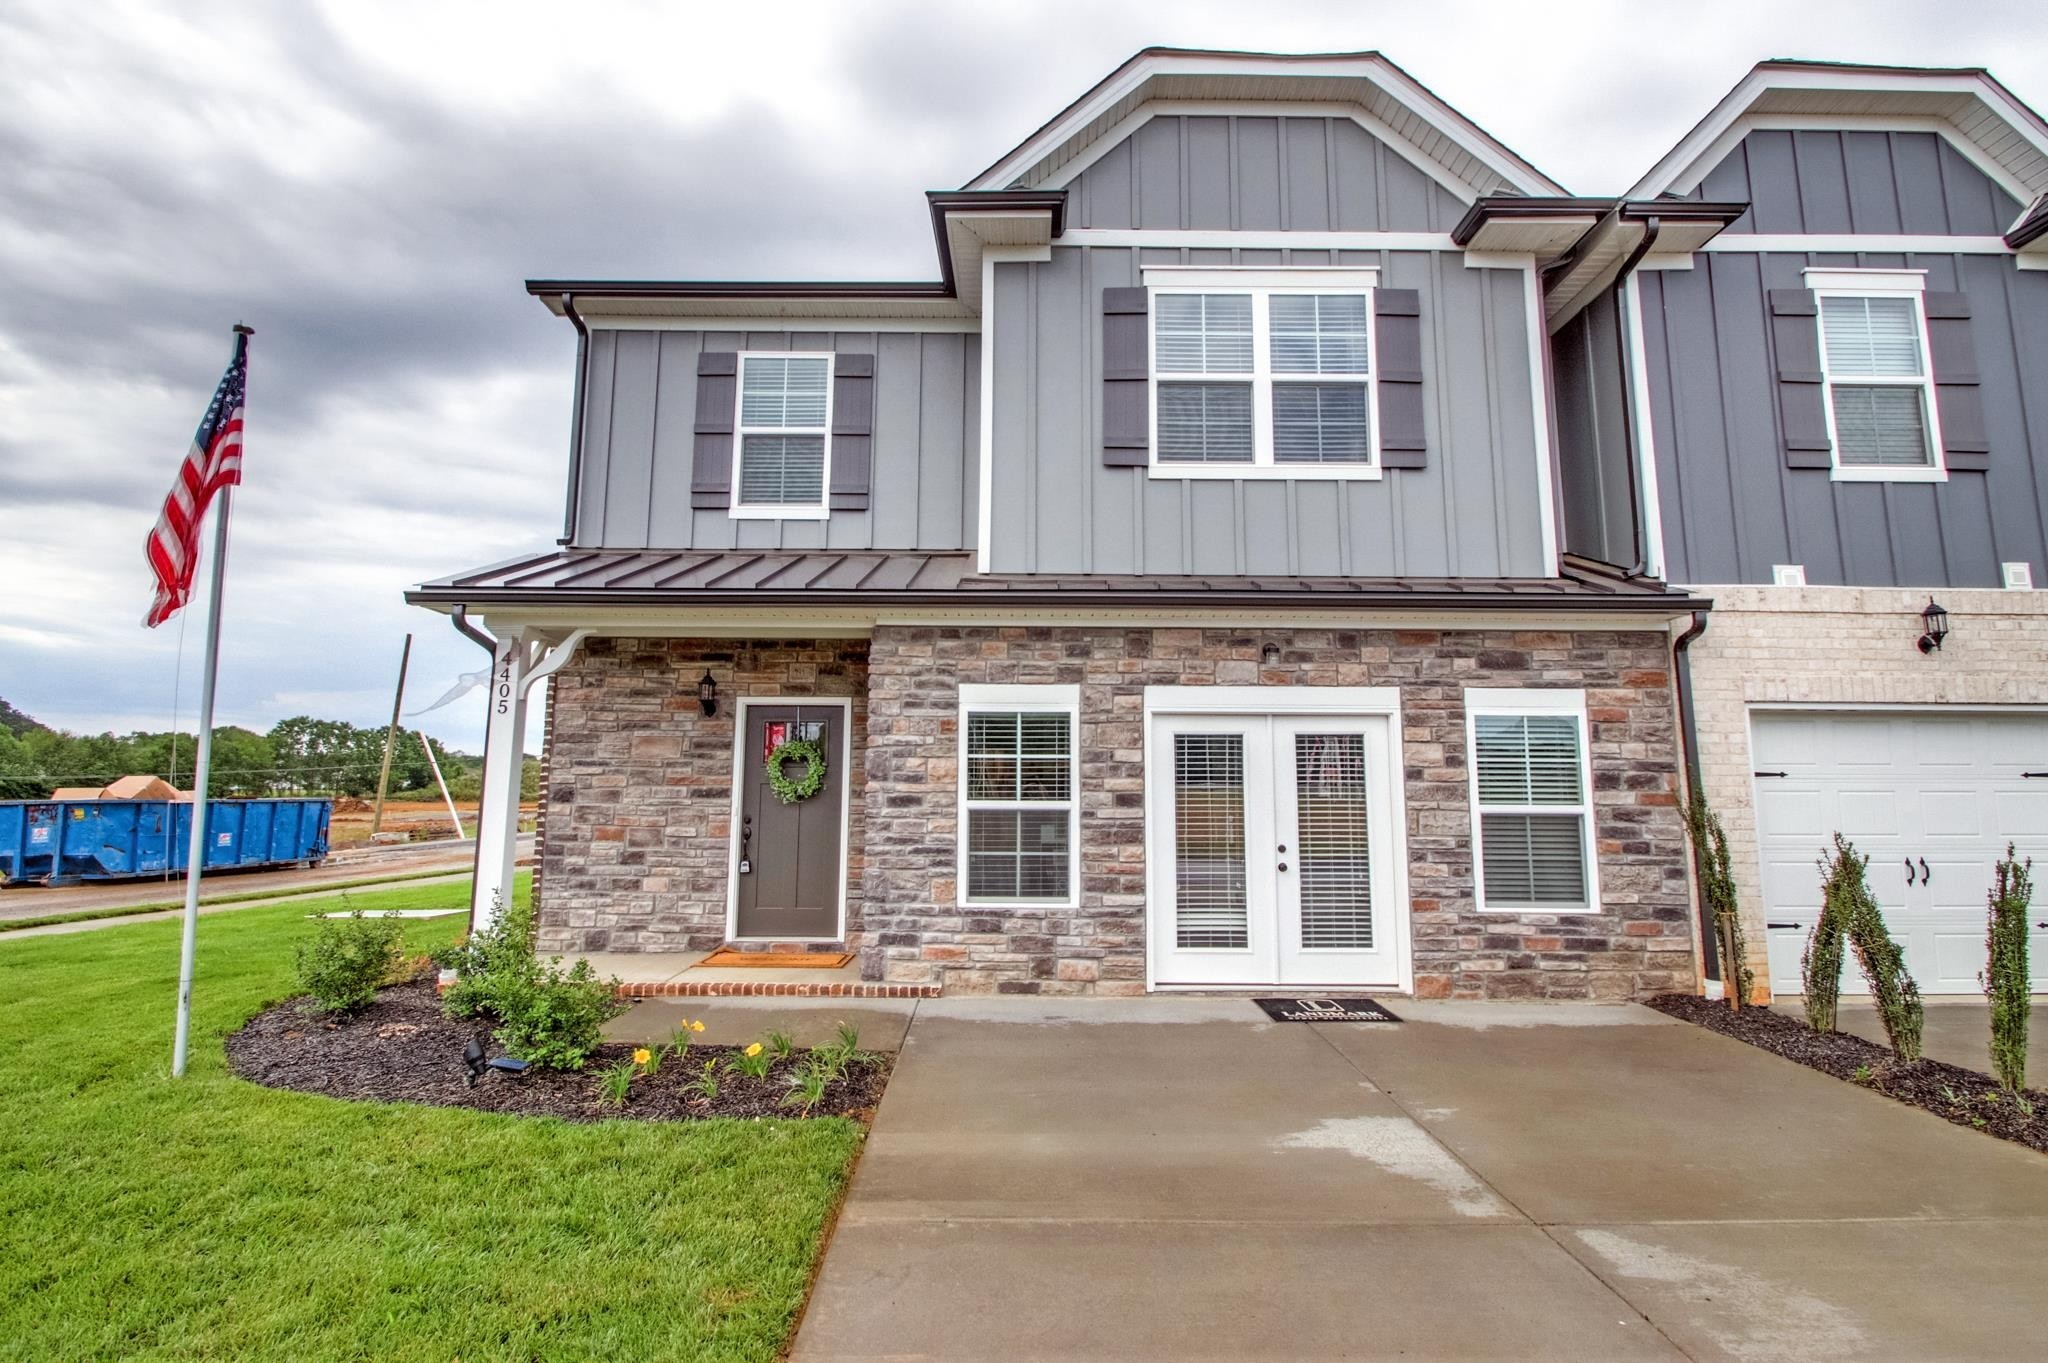 4427 Chusto, Murfreesboro, TN 37129 - Murfreesboro, TN real estate listing